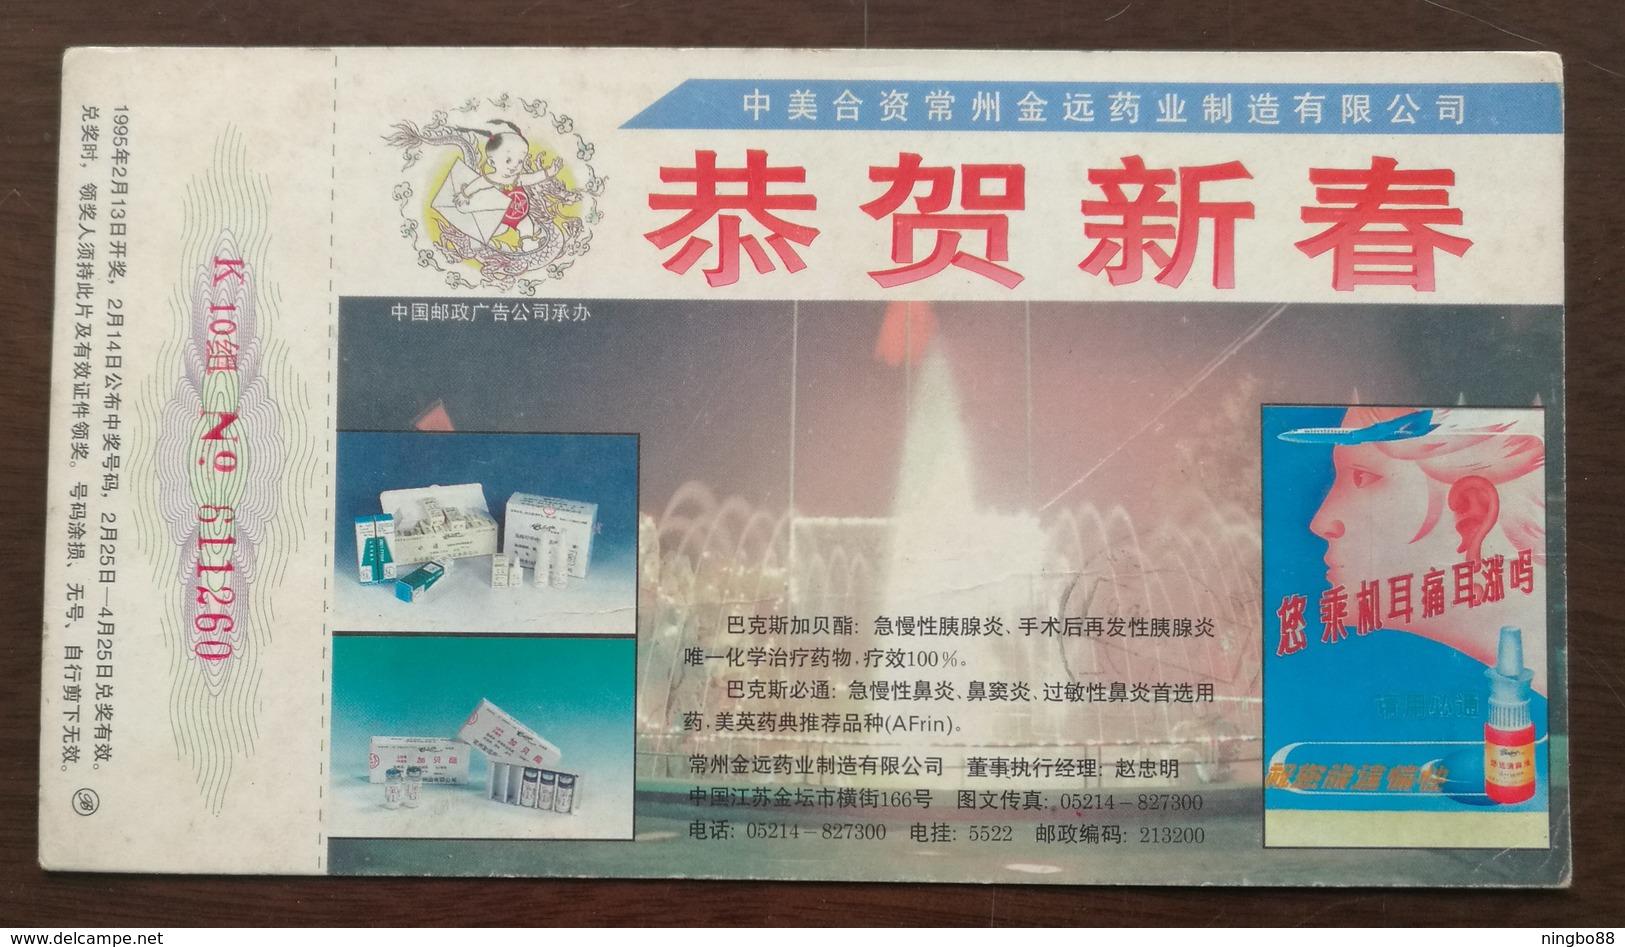 Drug For Pancreatitis,medicine For Nose Sinusitis,earache & Ear Harmogegathy By Airplane,CN95 Pharmaceutical Company PSC - Pharmacy